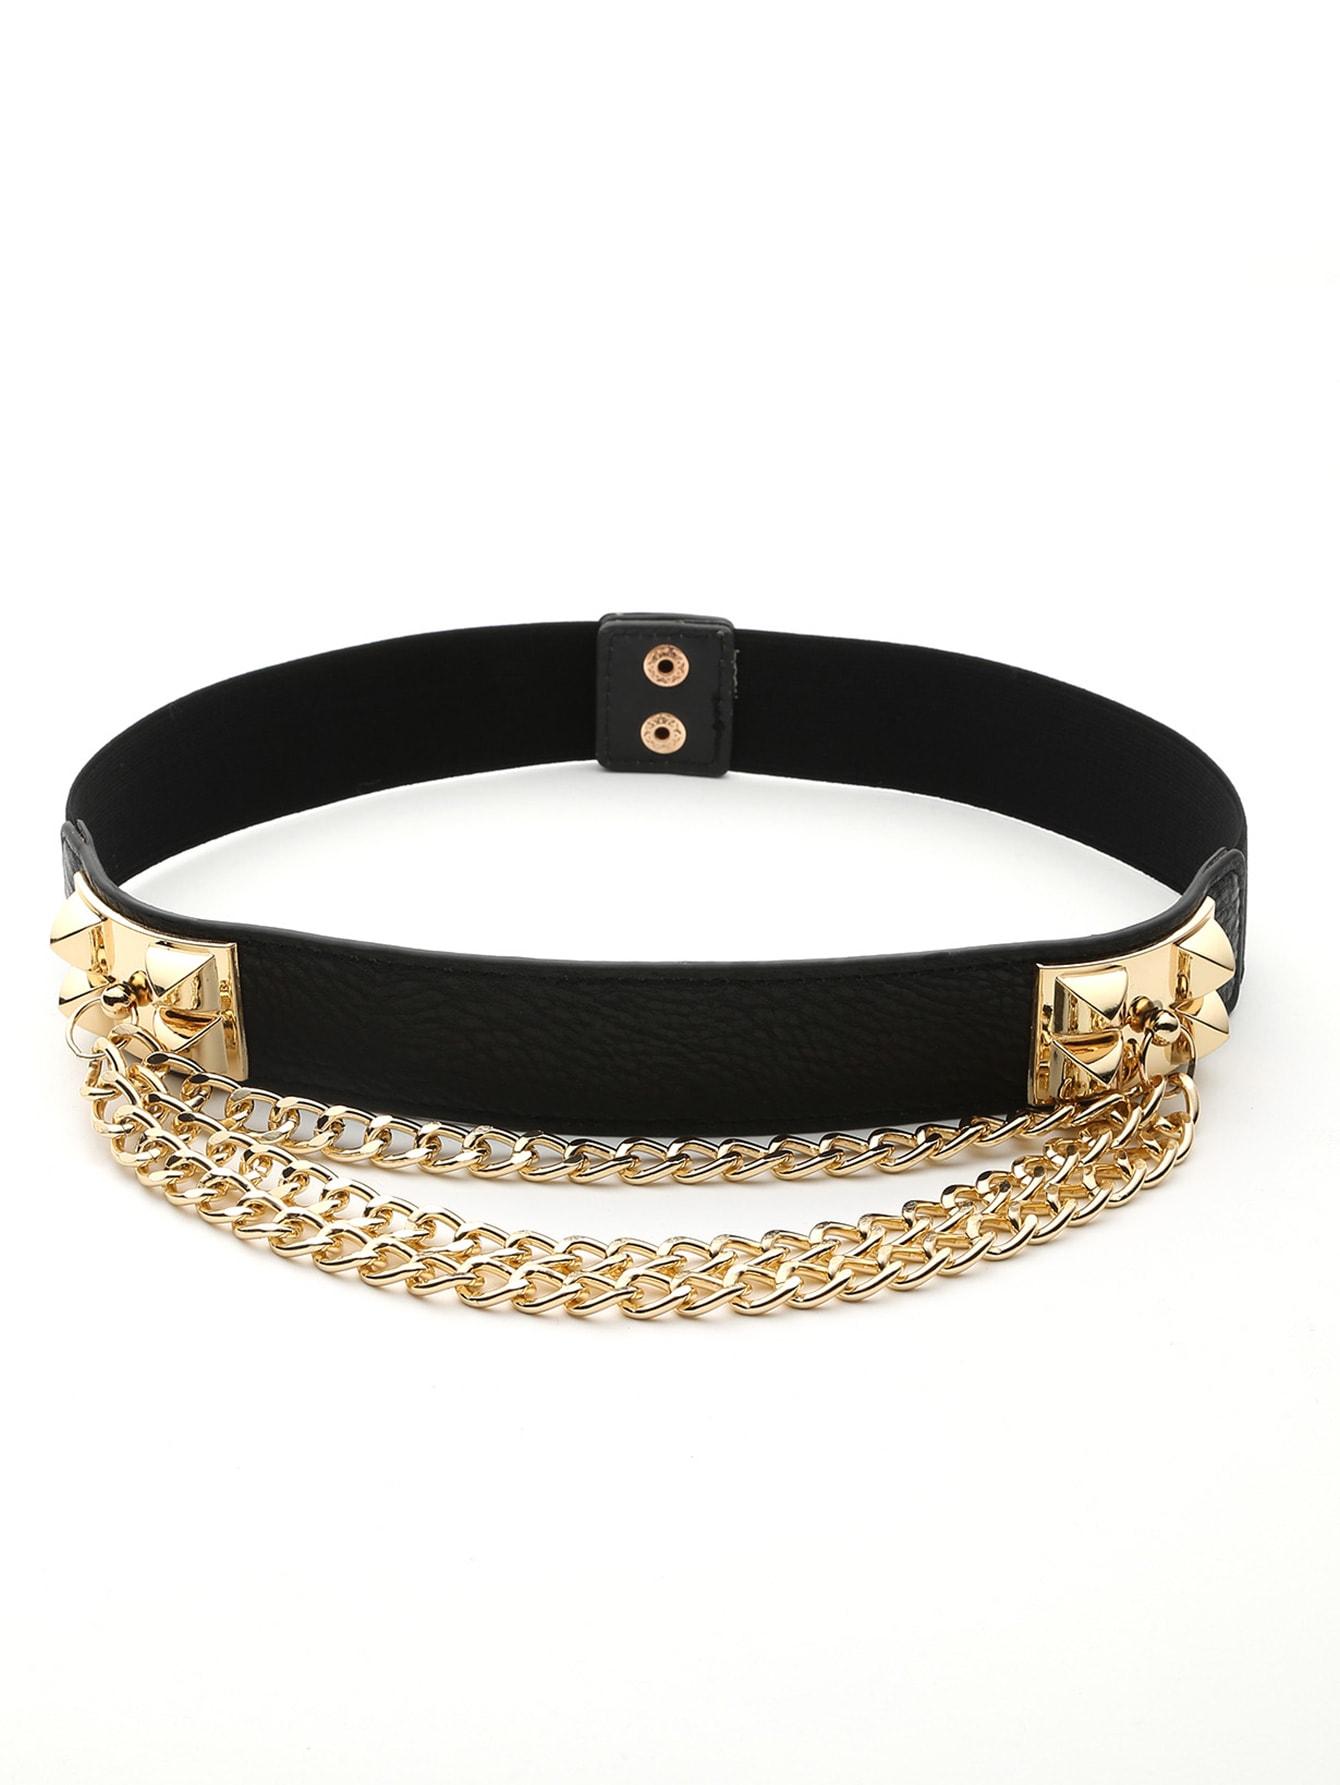 Layered Chain Detail Belt